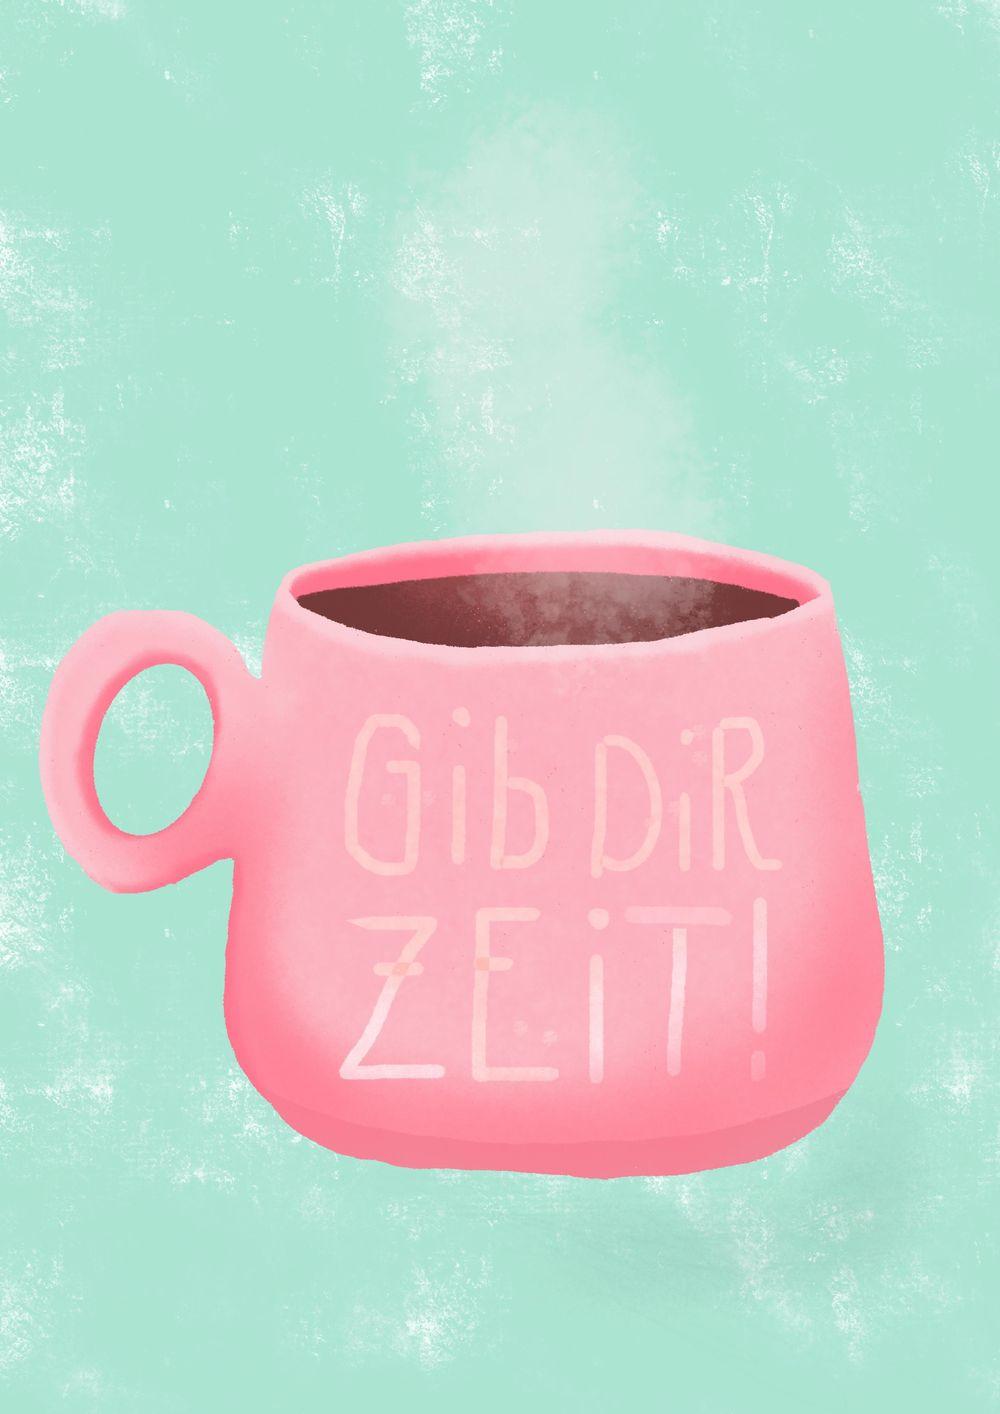 Coffee Mug Made with Procreate Pocket - image 1 - student project